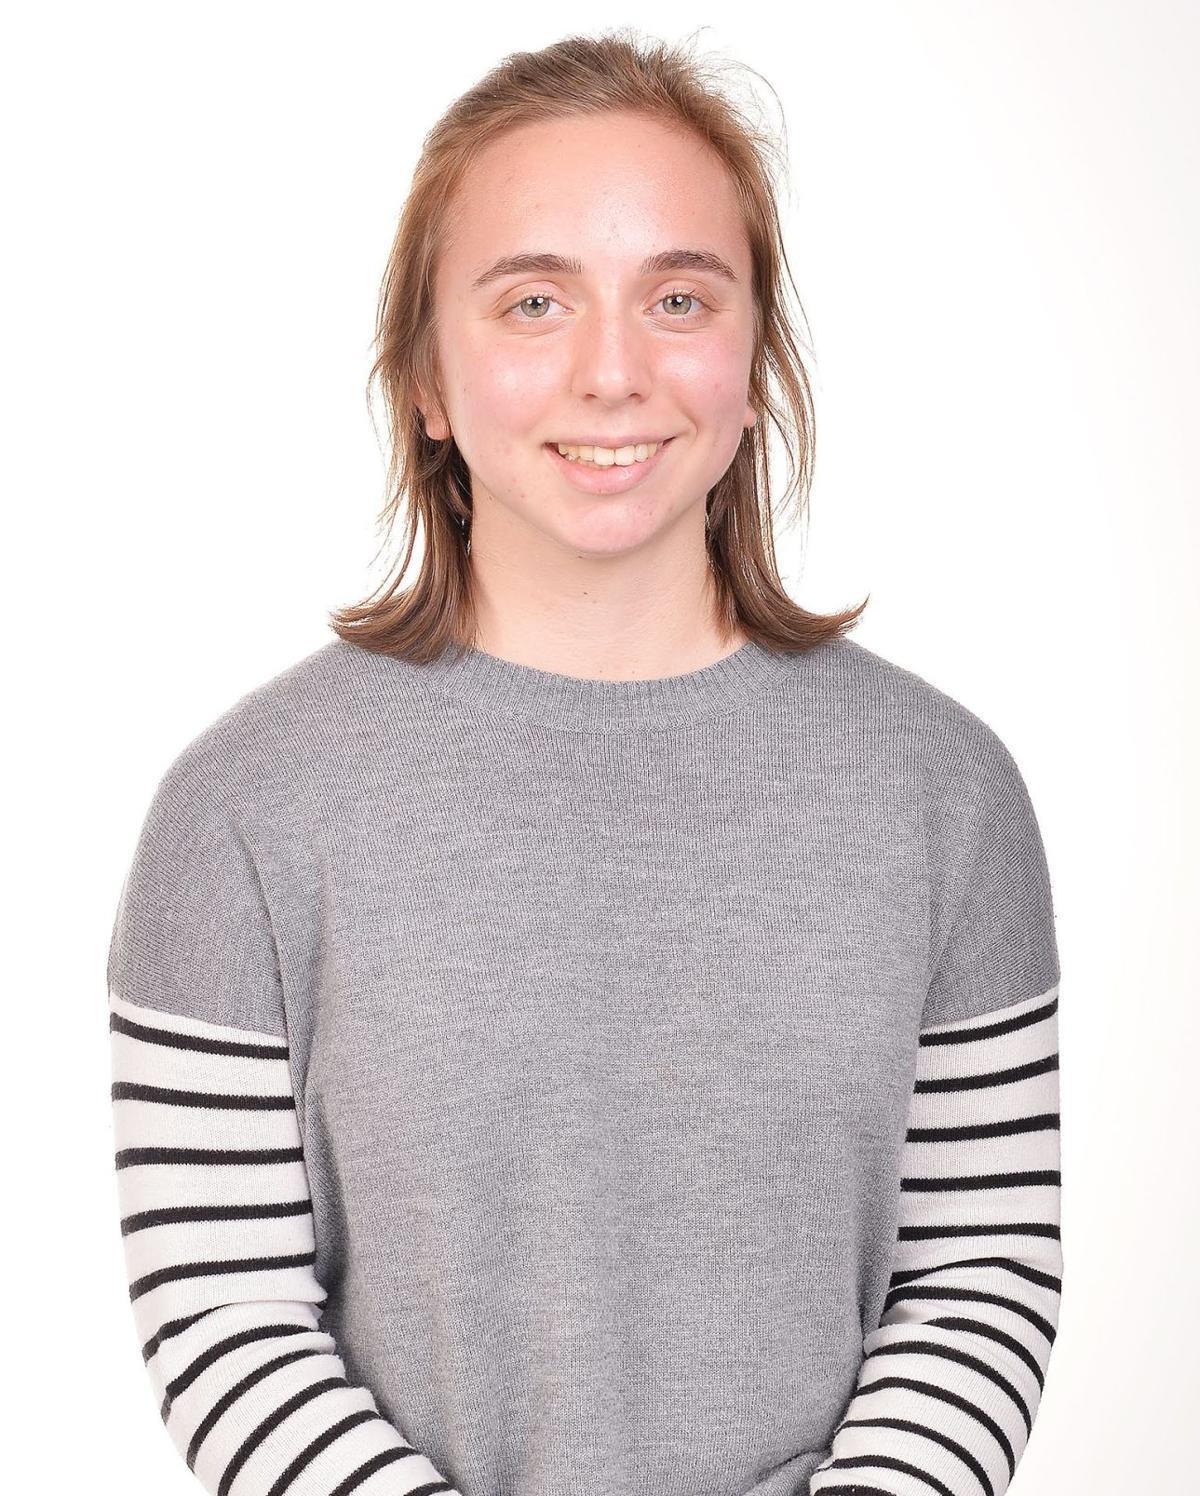 Ola High School 2019 STAR student Emma Stacey